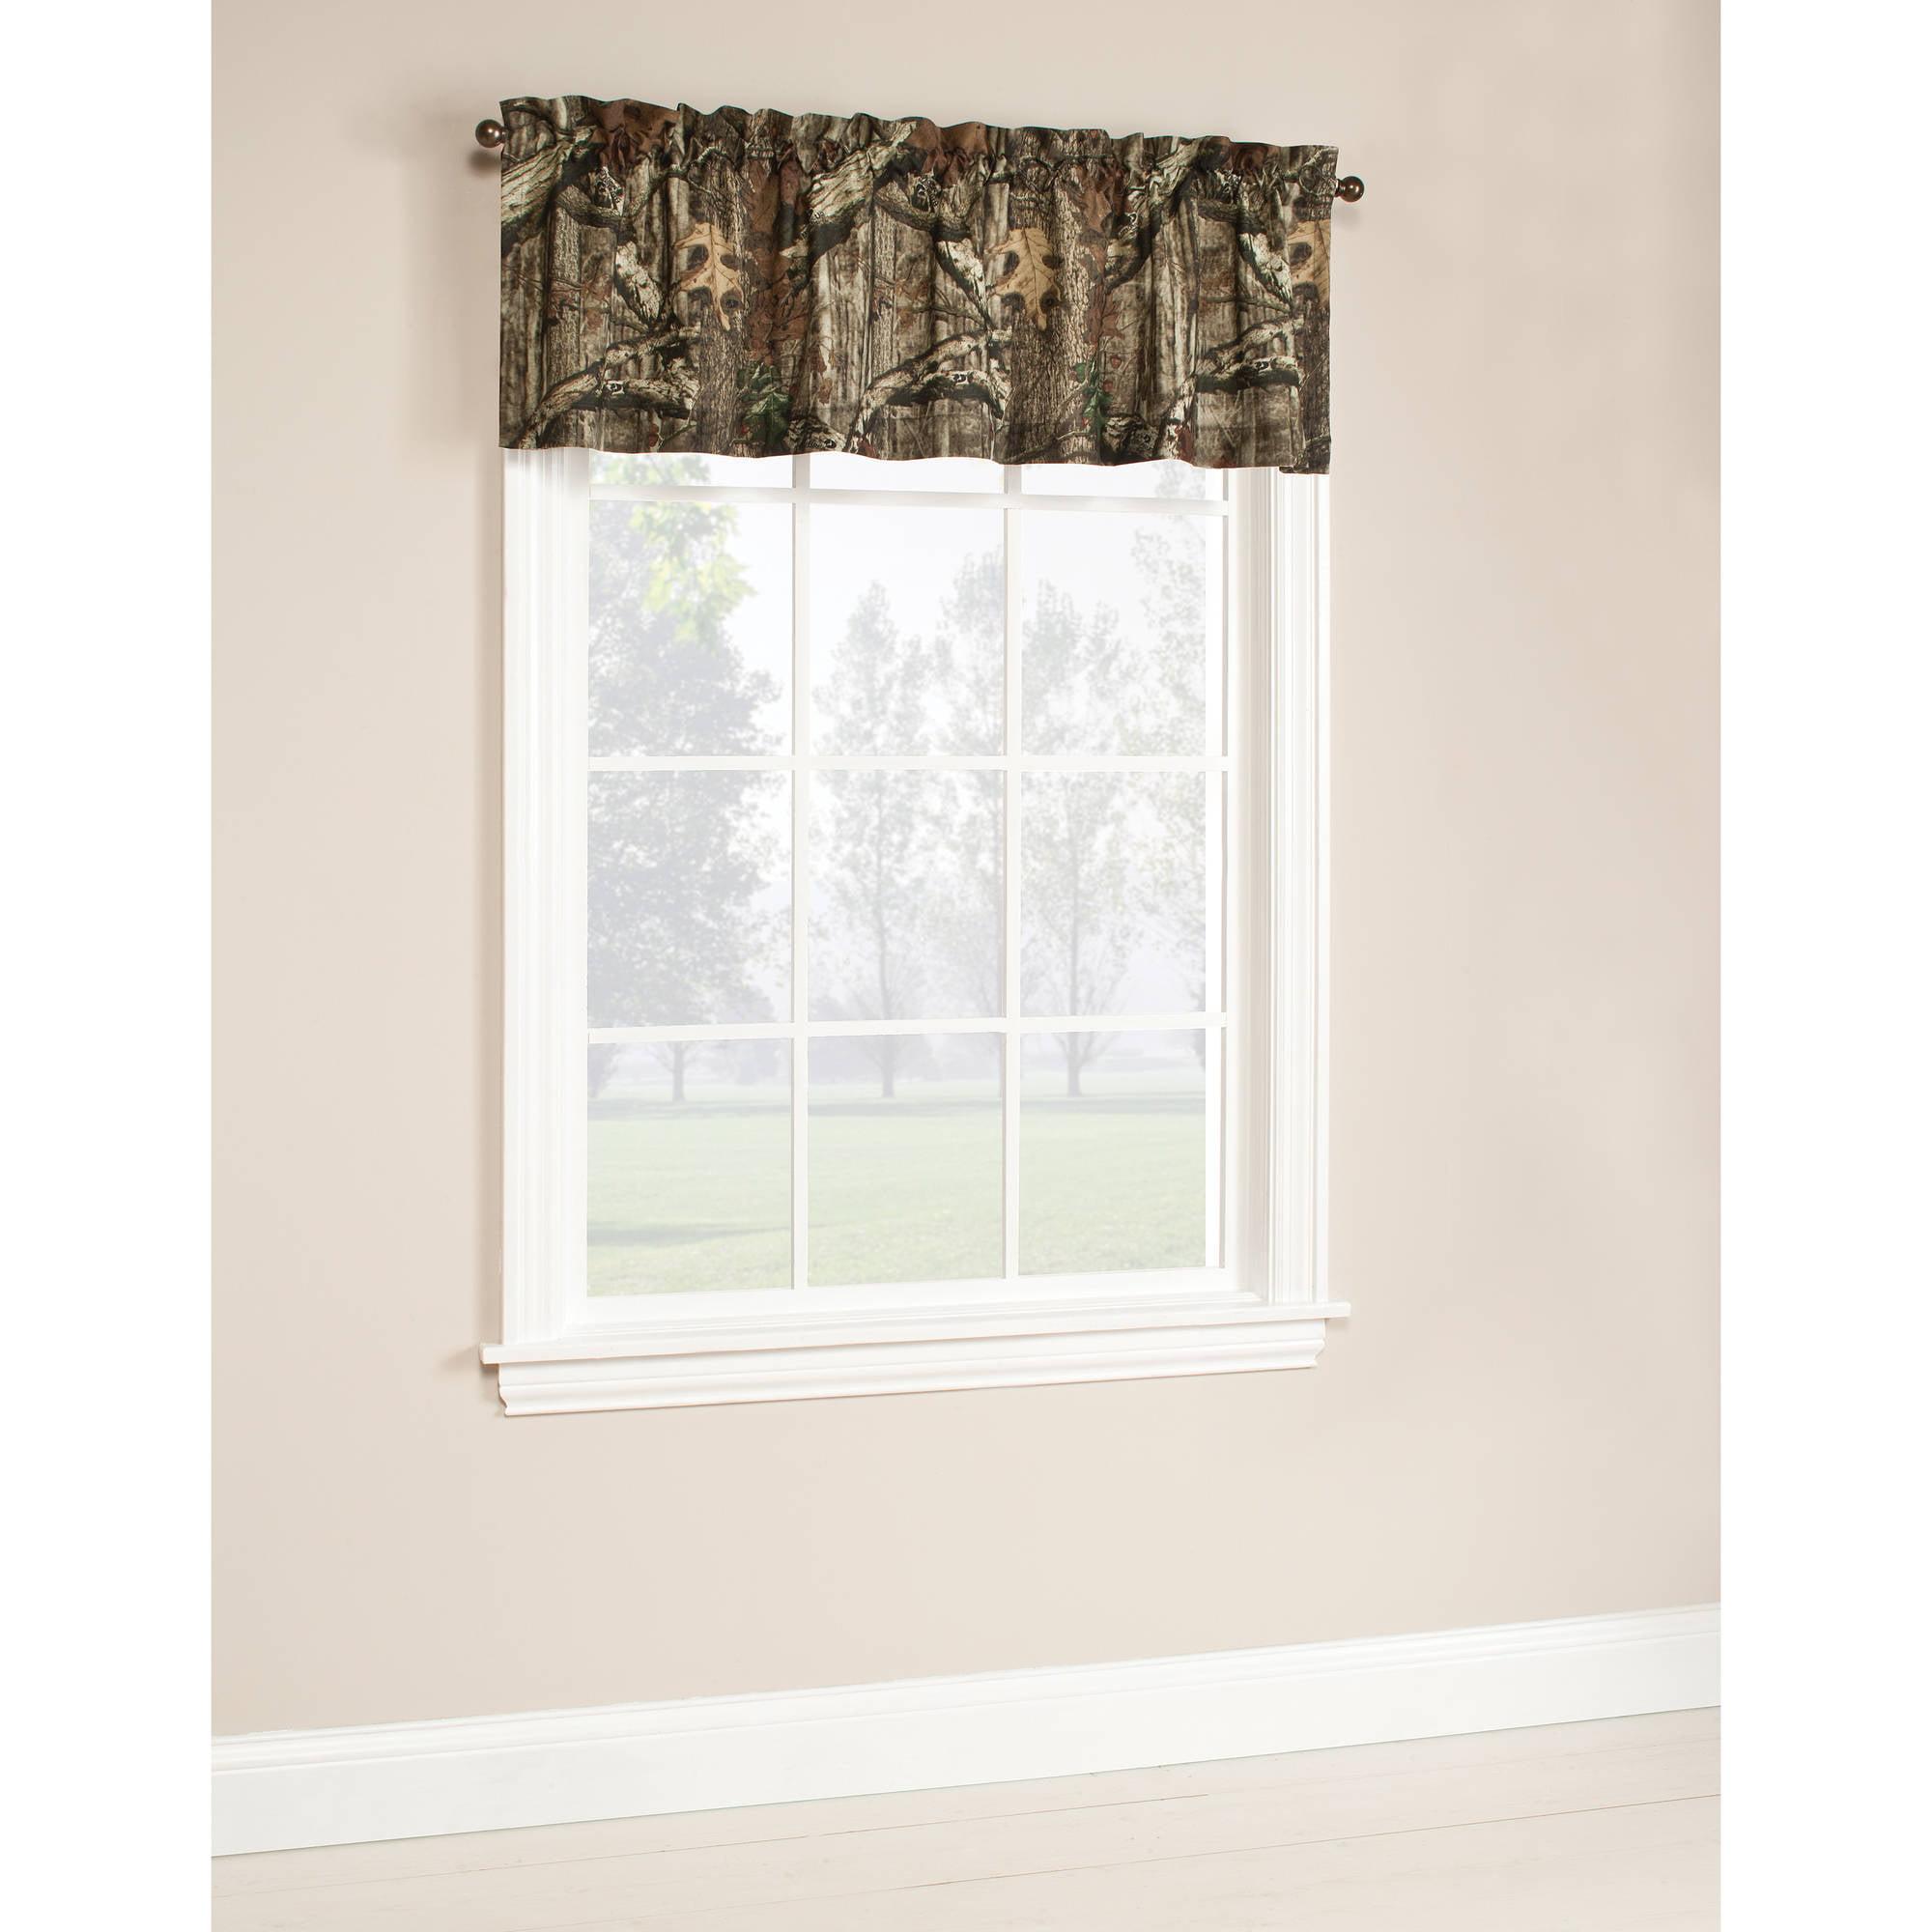 Mossy Oak Break Up Infinity Camouflage Print Window Curtain Panels    Walmart.com